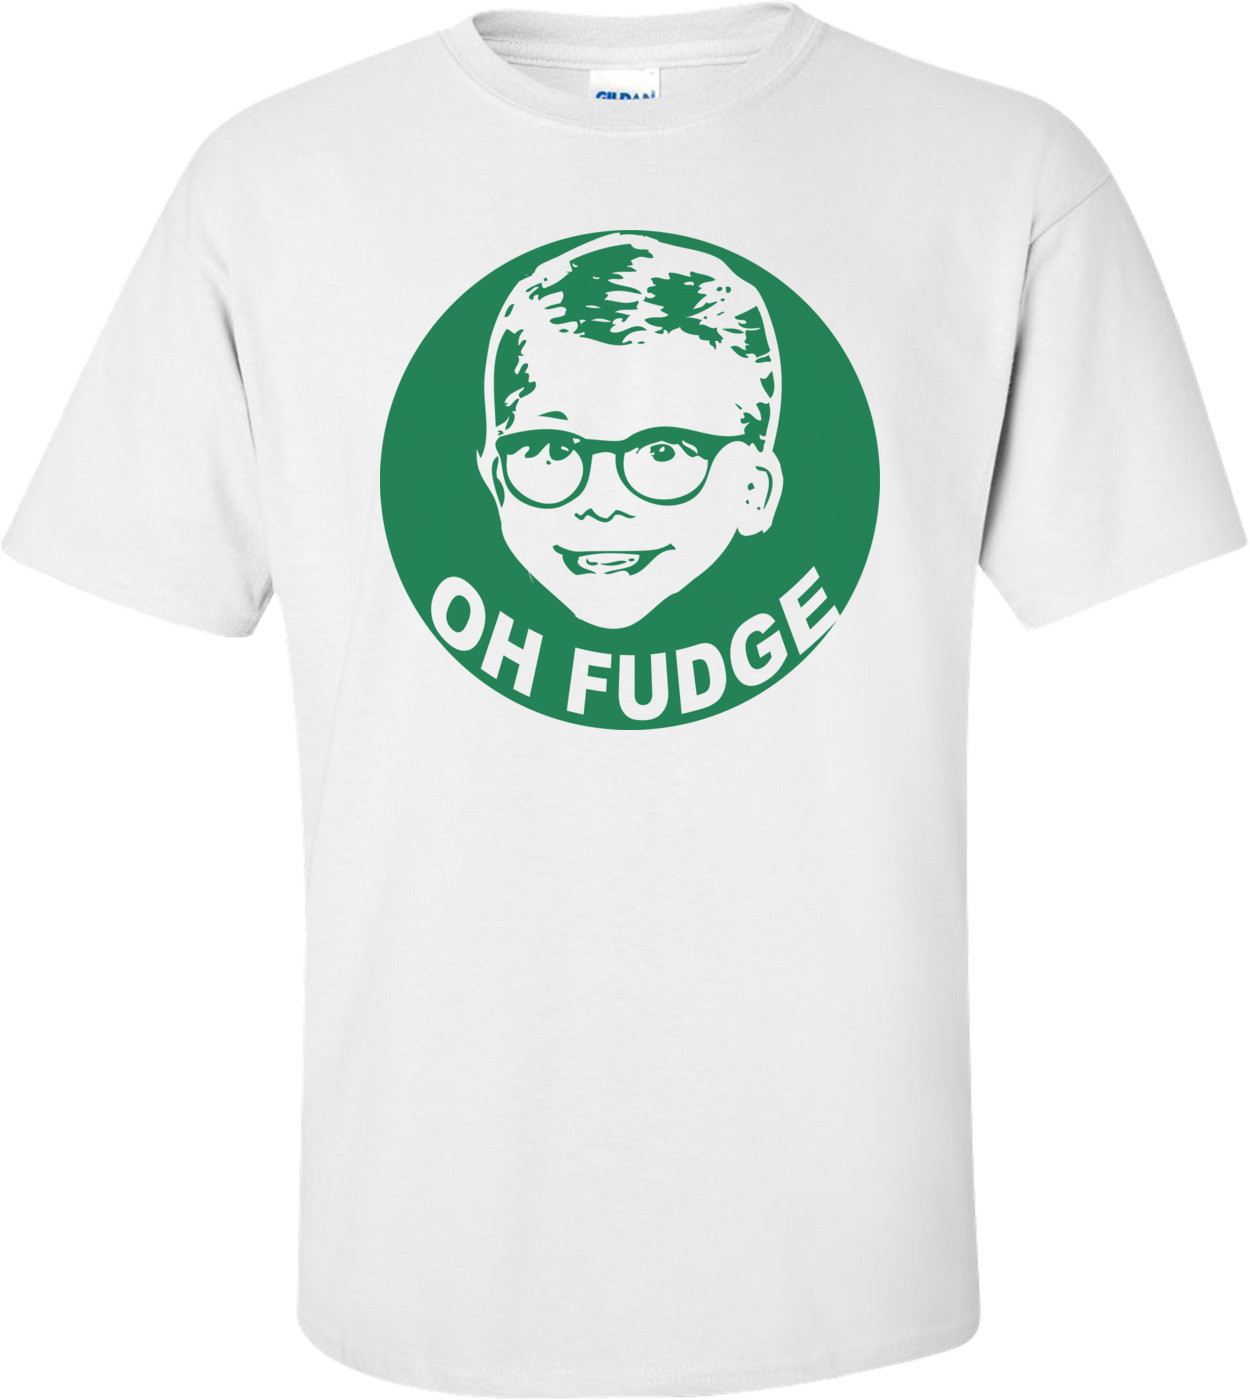 Oh Fudge - A Christmas Story